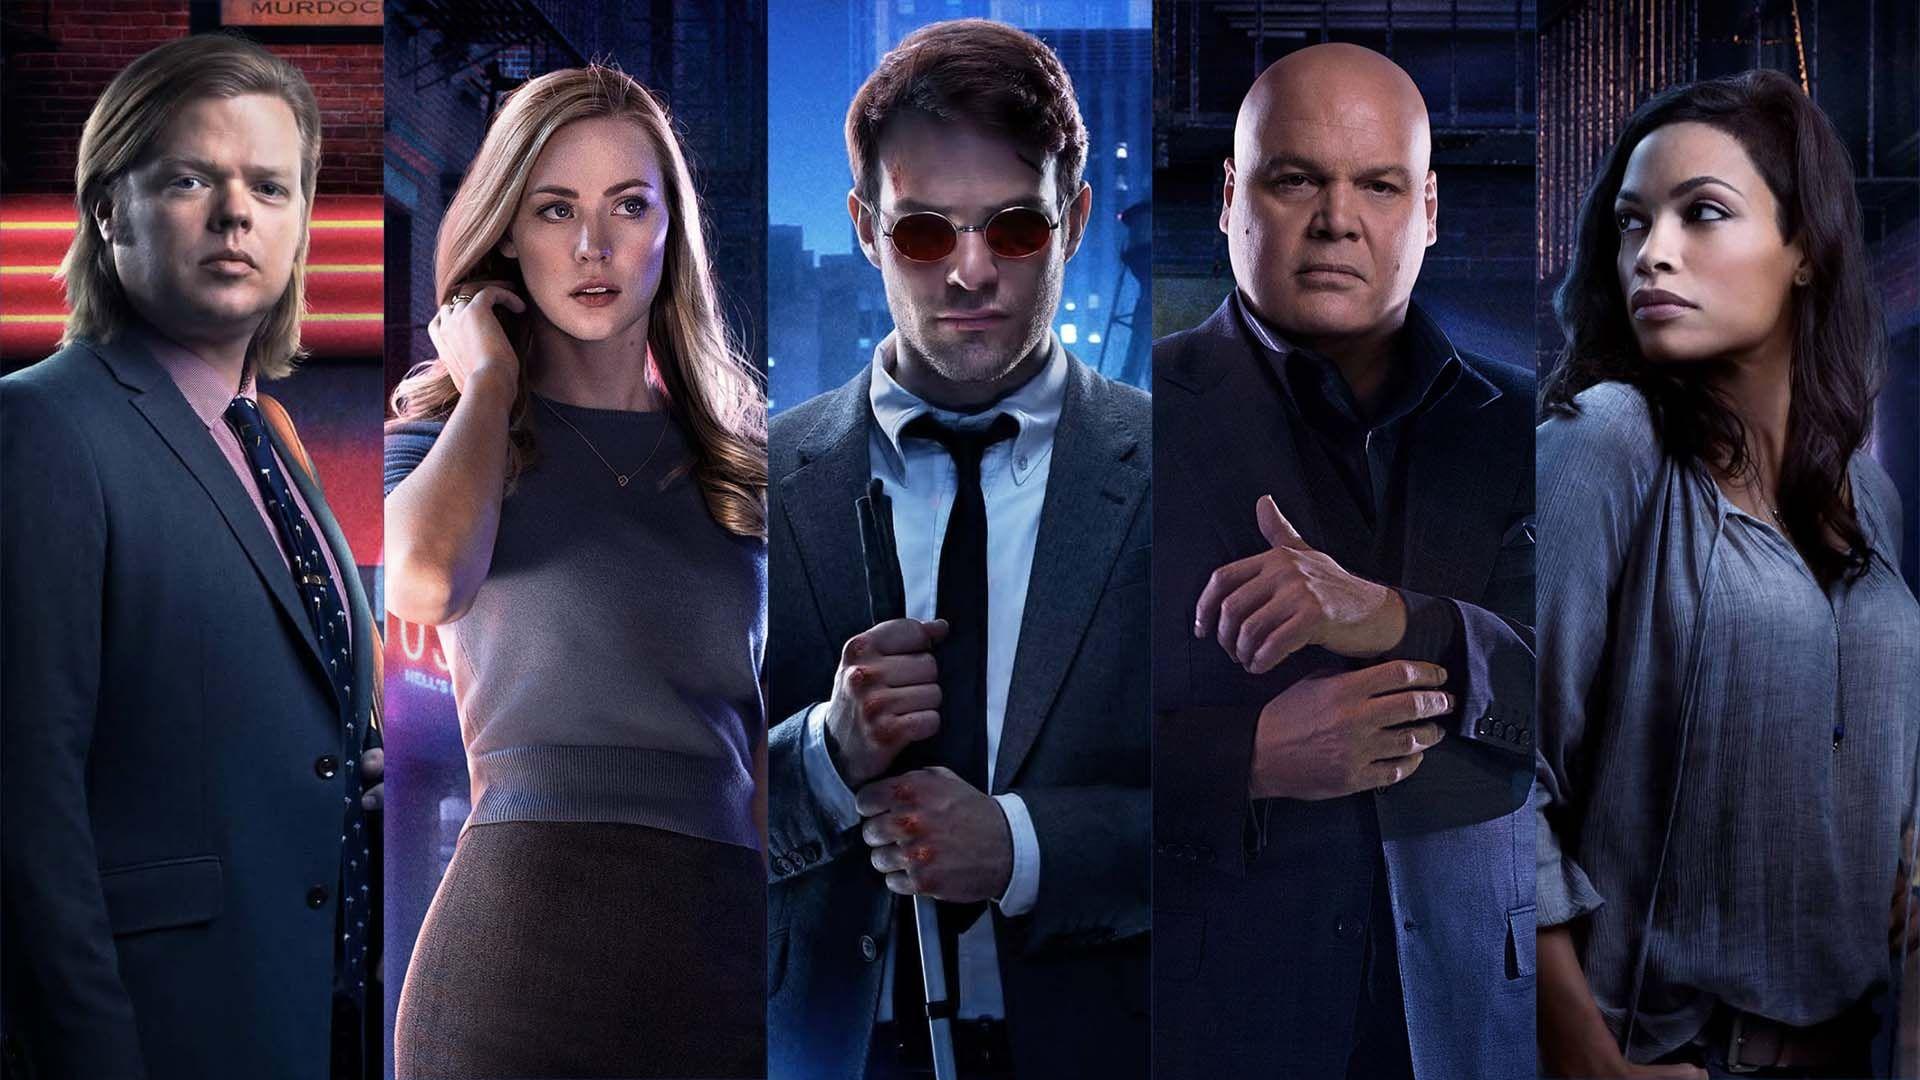 Daredevil Netflix Wallpaper Cast Of Season One Daredevil Netflix Daredevil Marvel Daredevil